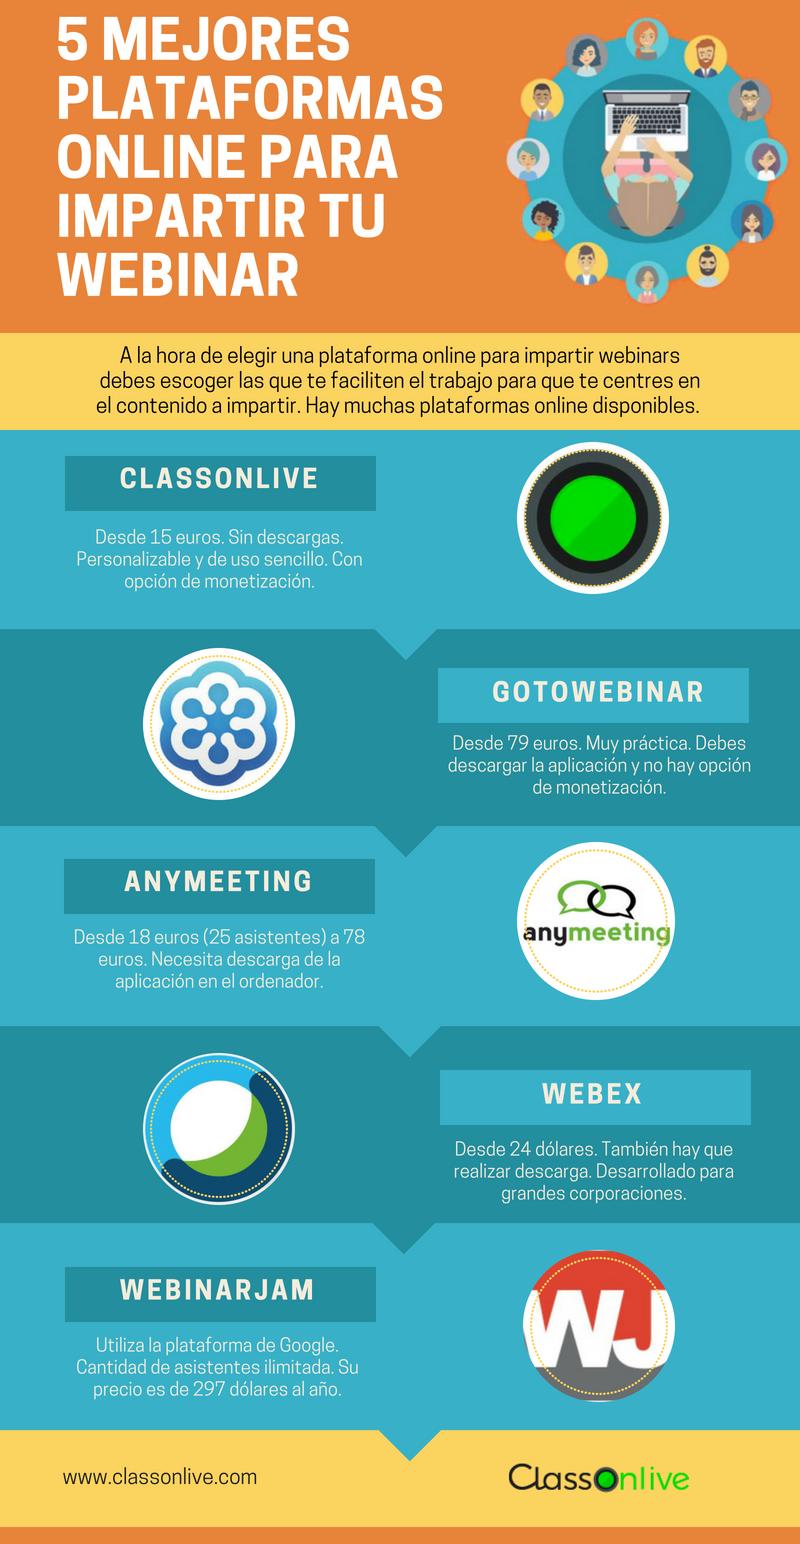 mejor plataforma para impartir webinar